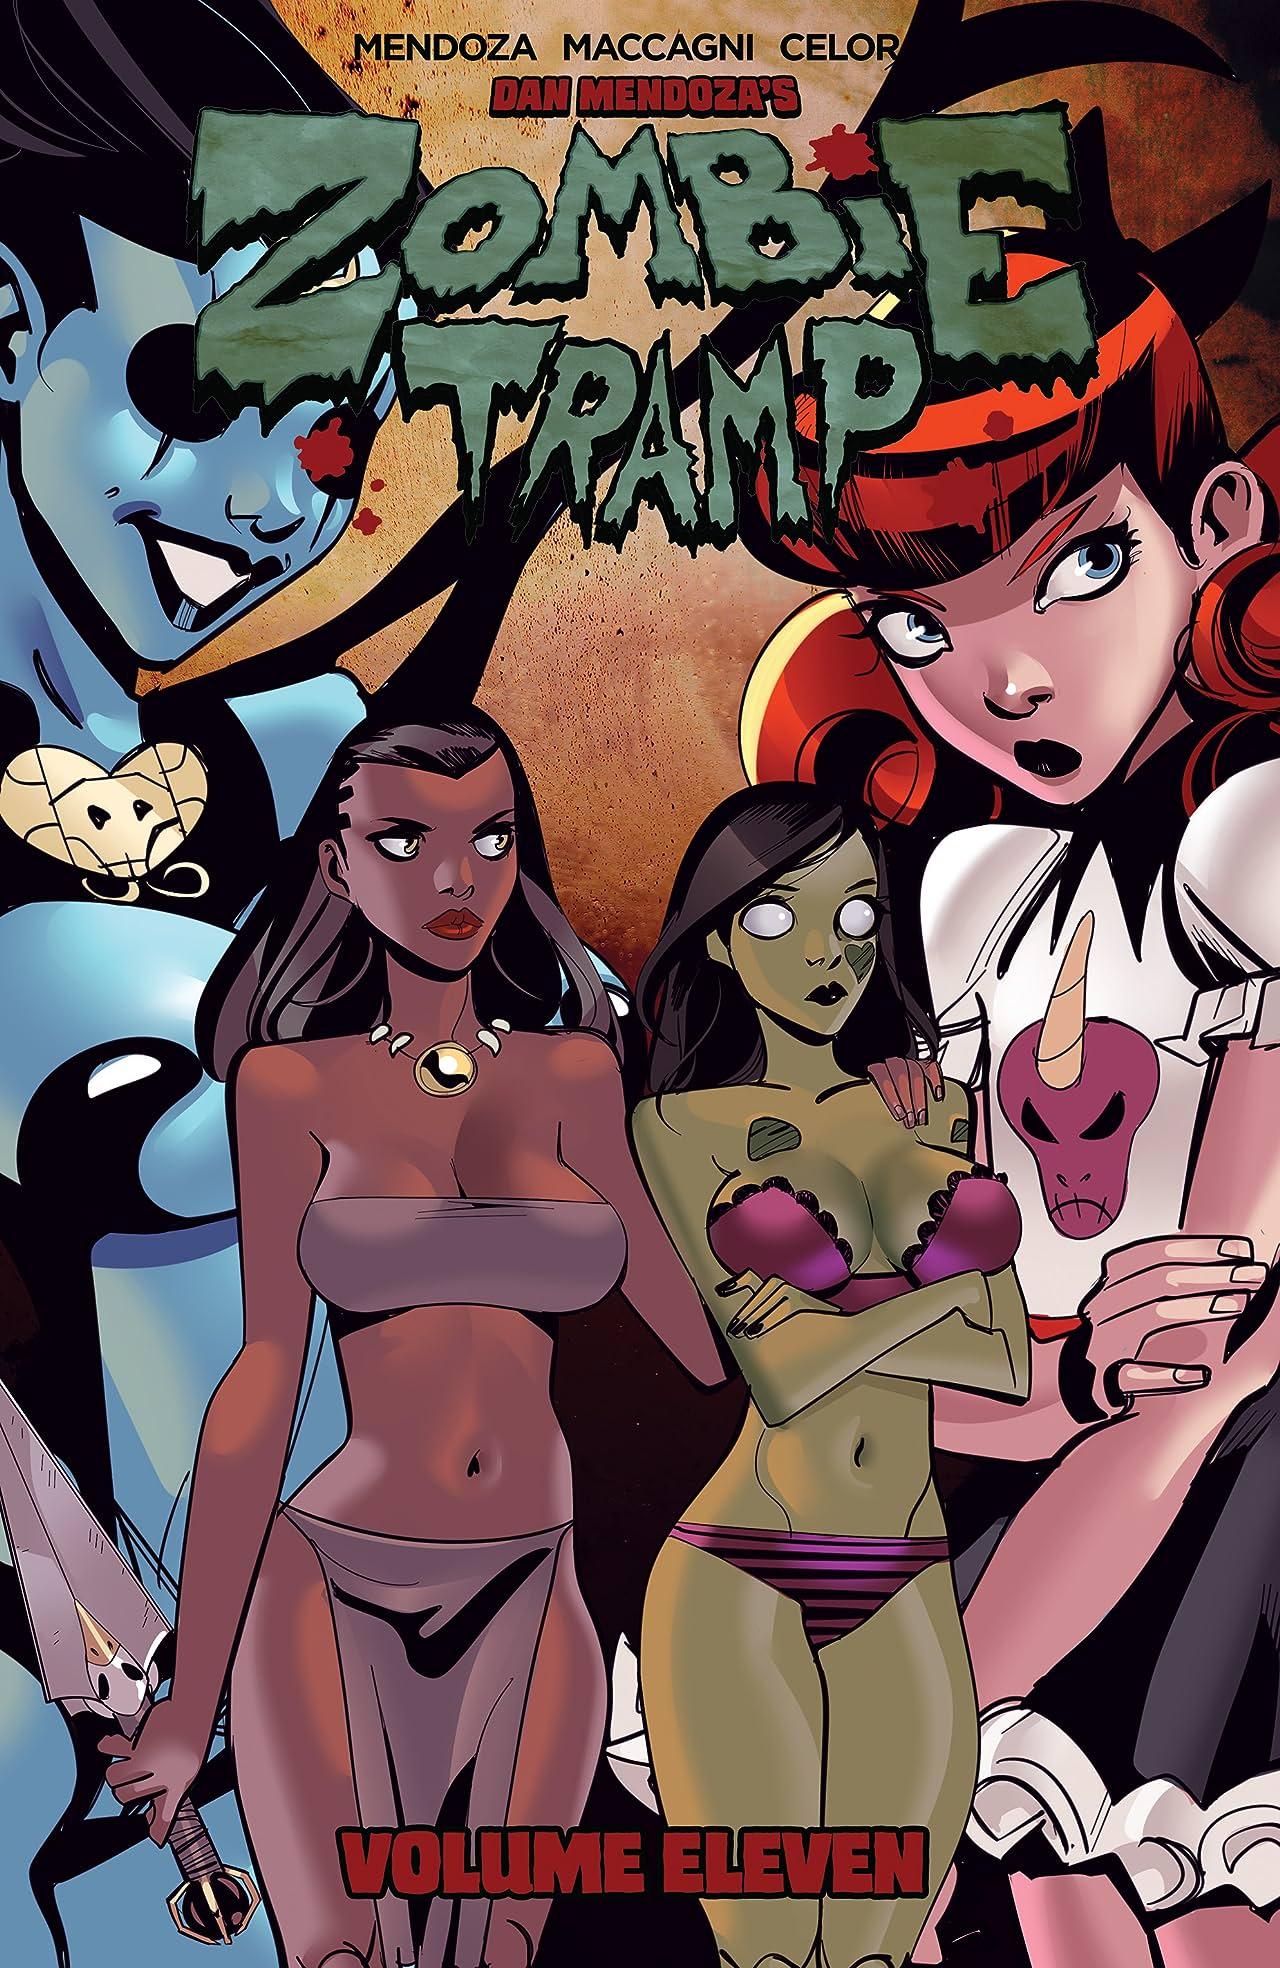 Zombie Tramp Vol. 11: Demon Dames and Scandalous Games